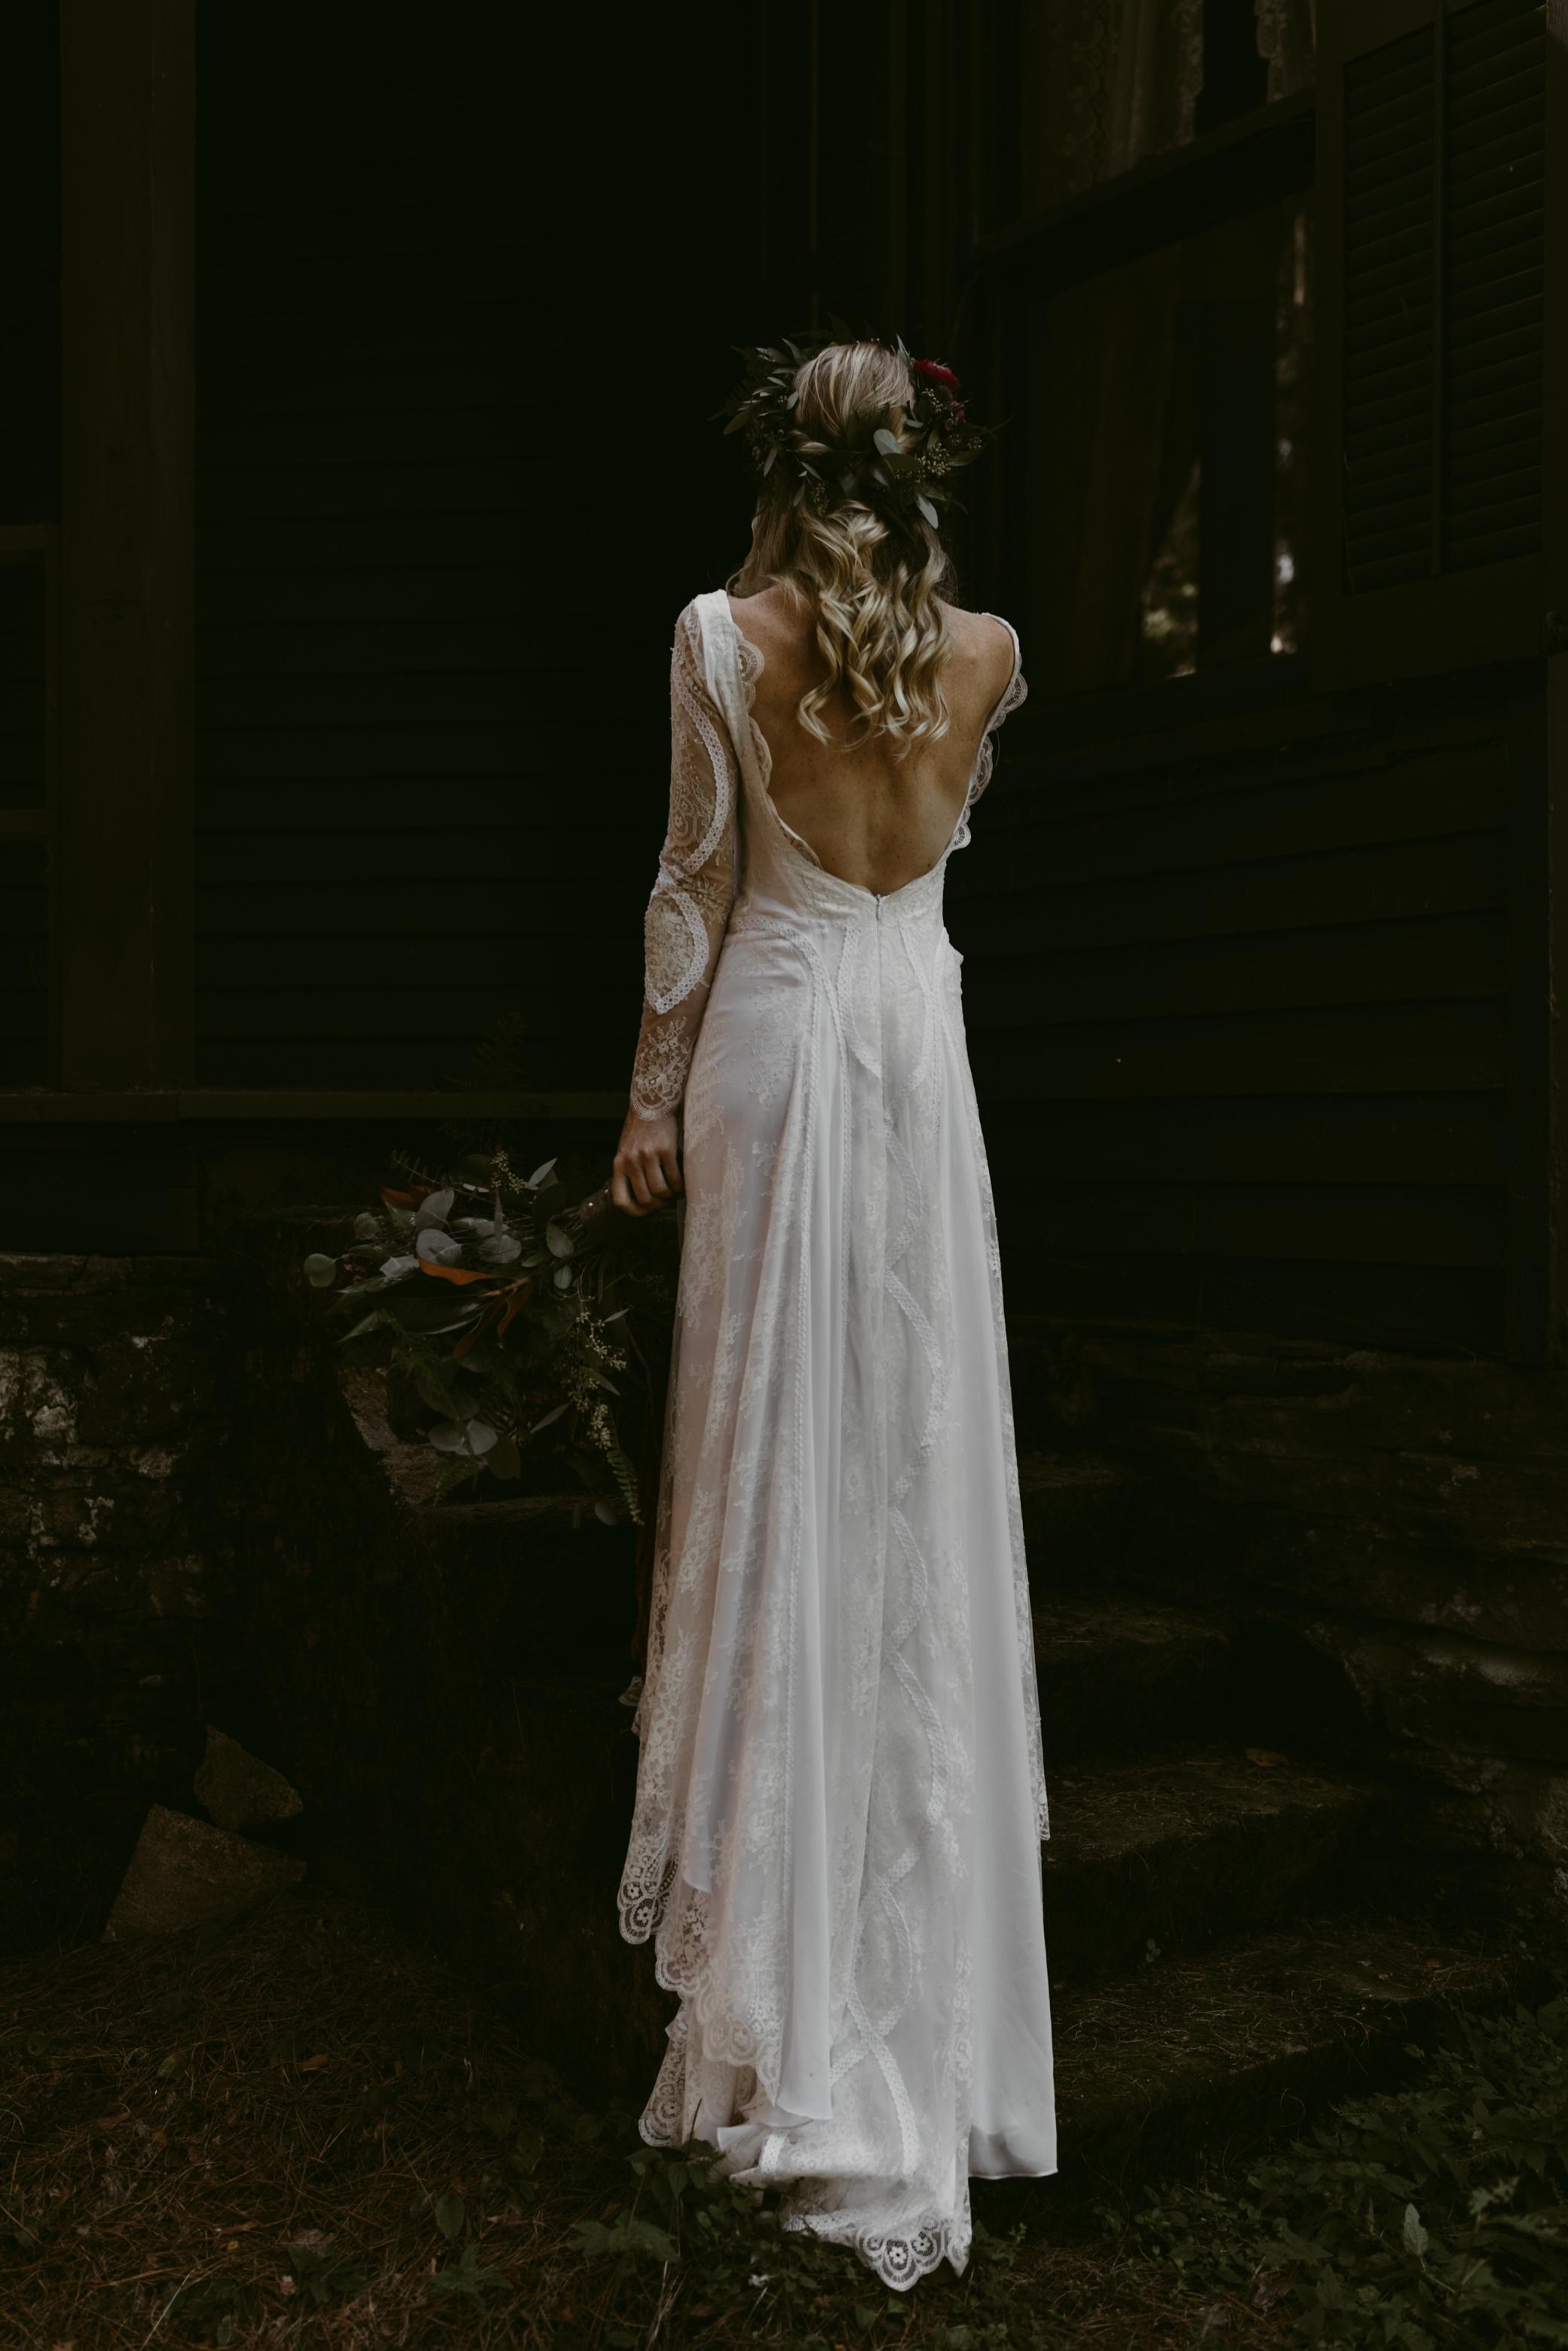 053_Huntsville Wedding  (203 of 689)_Wedding_photographer_Huntsville.jpg